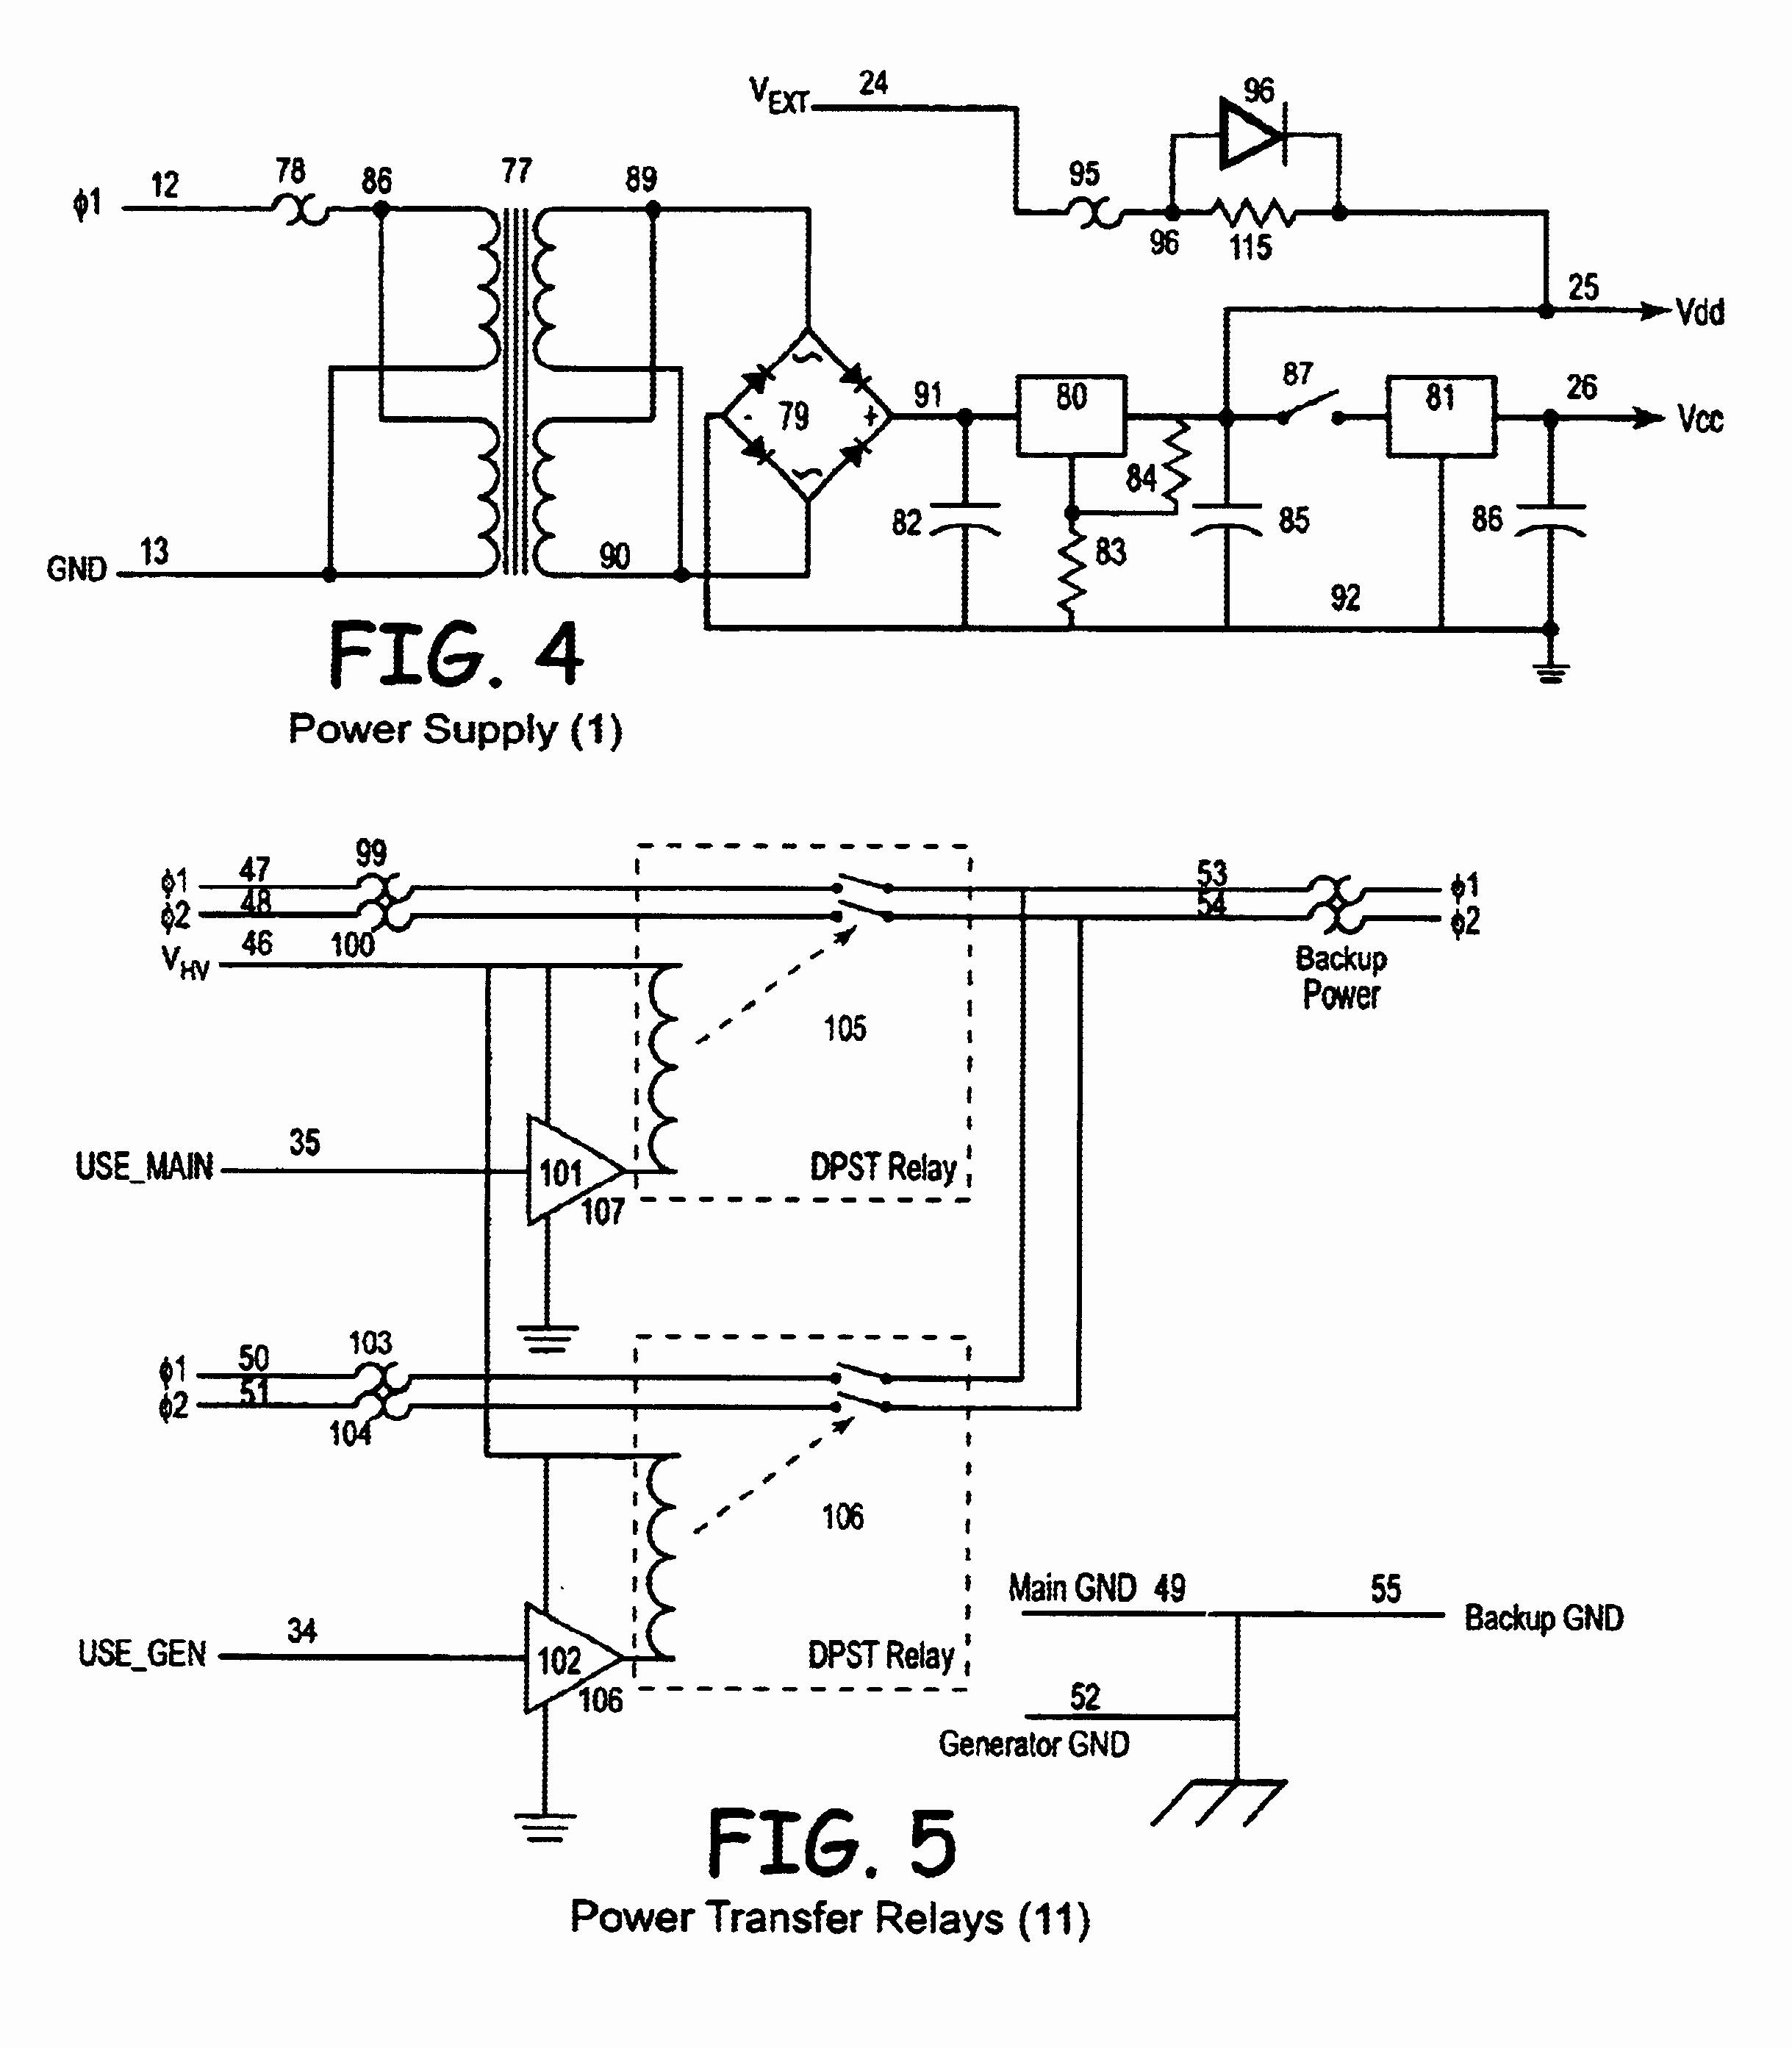 Generator Automatic Transfer Switch Wiring Diagram for Generac Automatic Transfer Switch Wiring Diagram